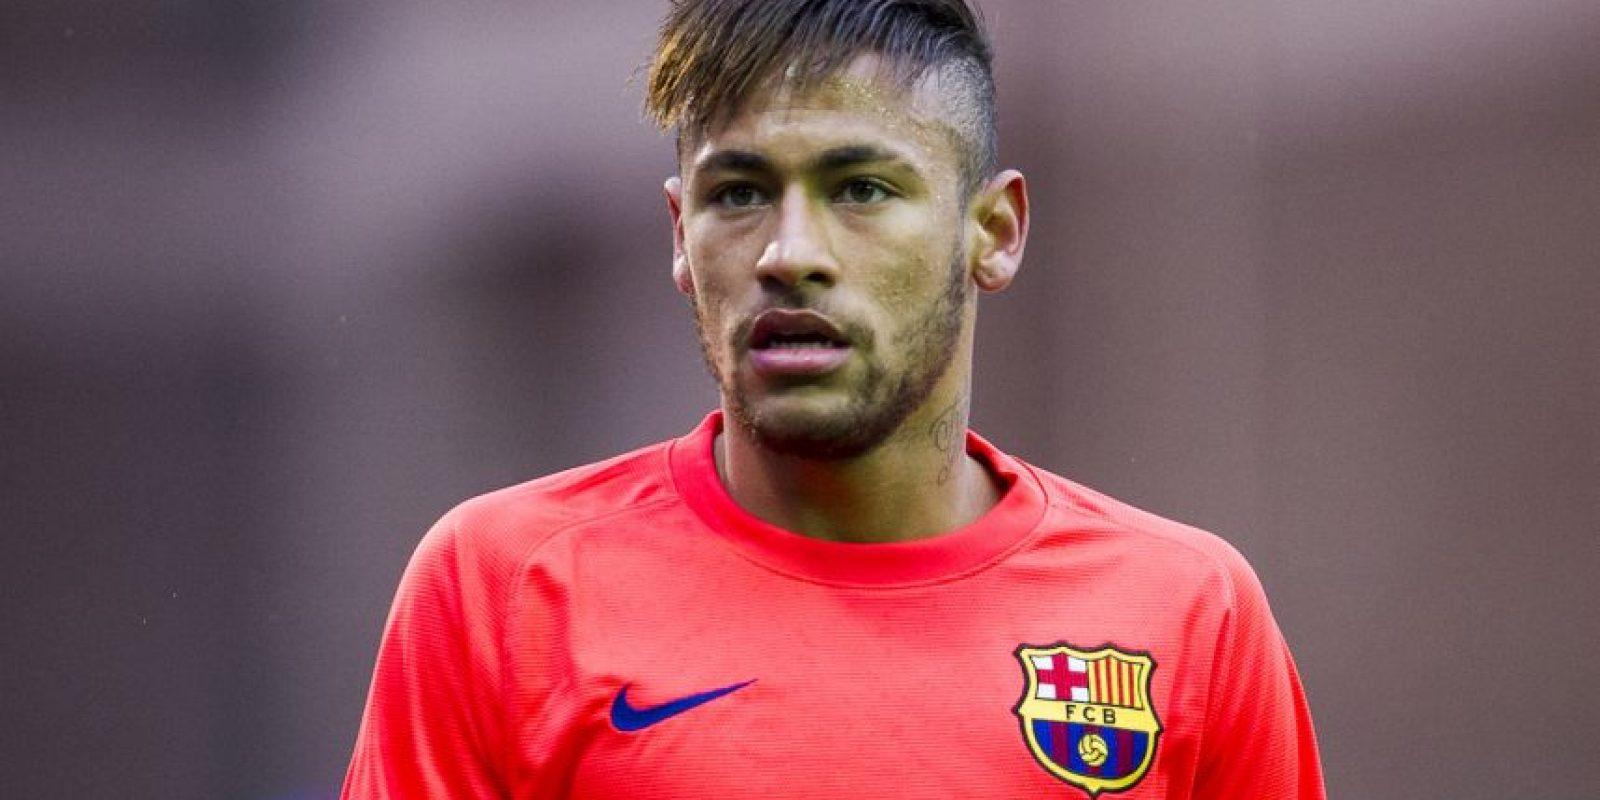 5. Neymar Foto:Getty Images